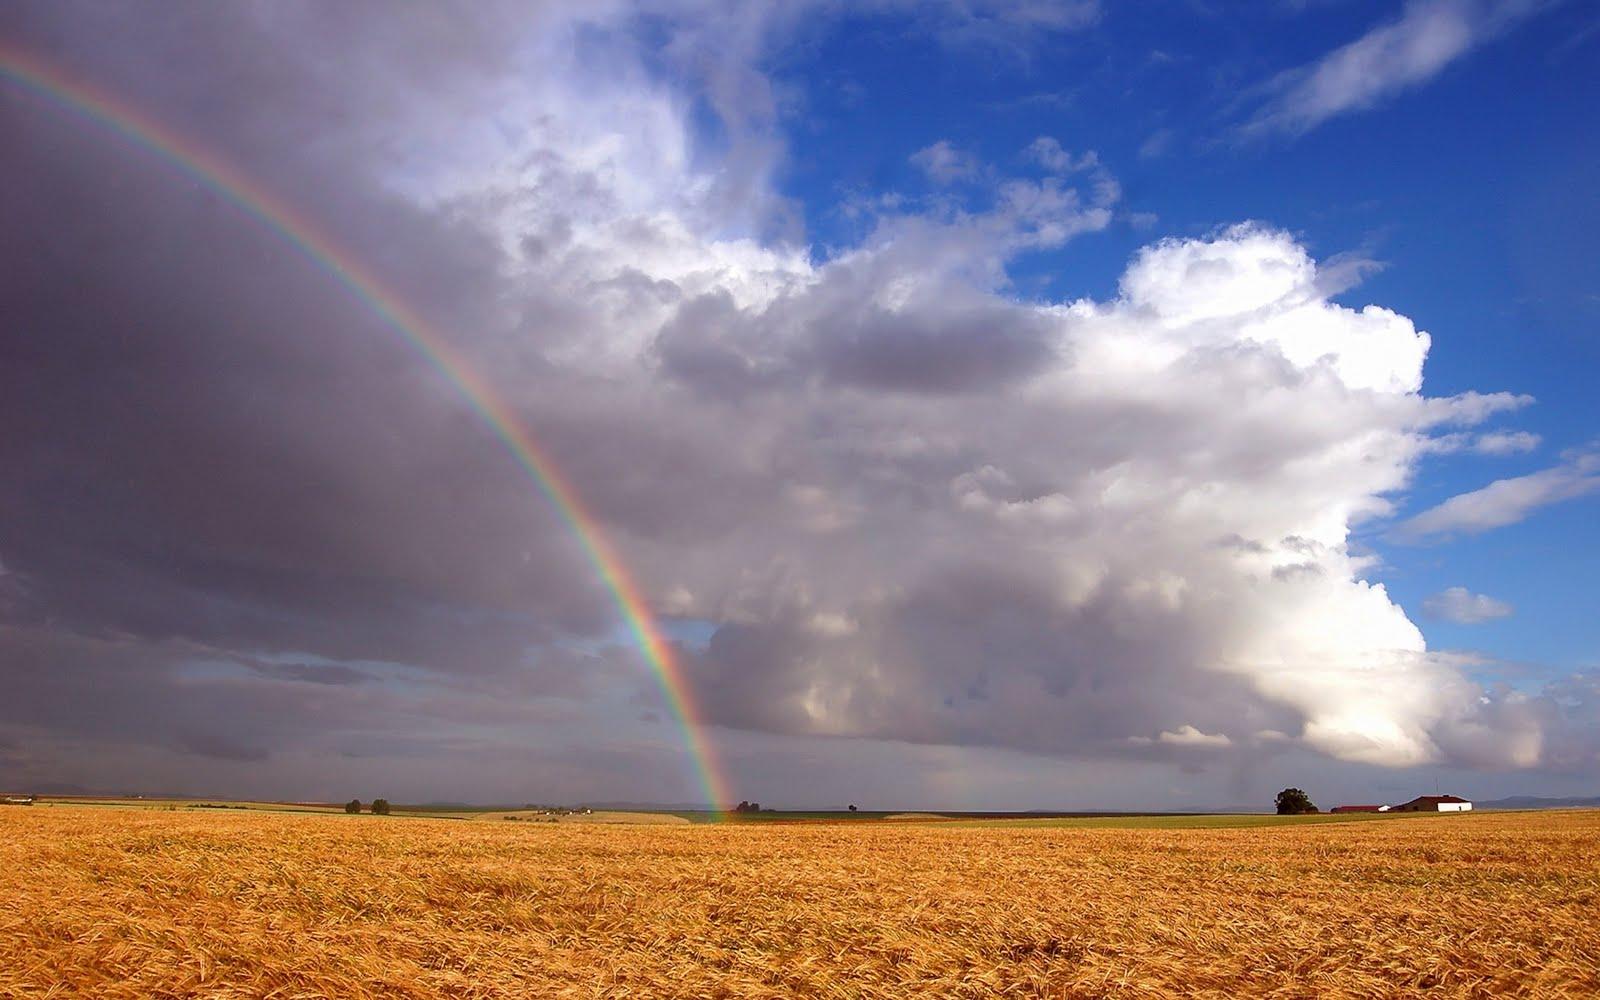 http://4.bp.blogspot.com/_2IU2Nt4rD1k/TDorLev2SDI/AAAAAAAAB3U/8qBGL2KROI4/s1600/rainbow_wallpaper.jpg